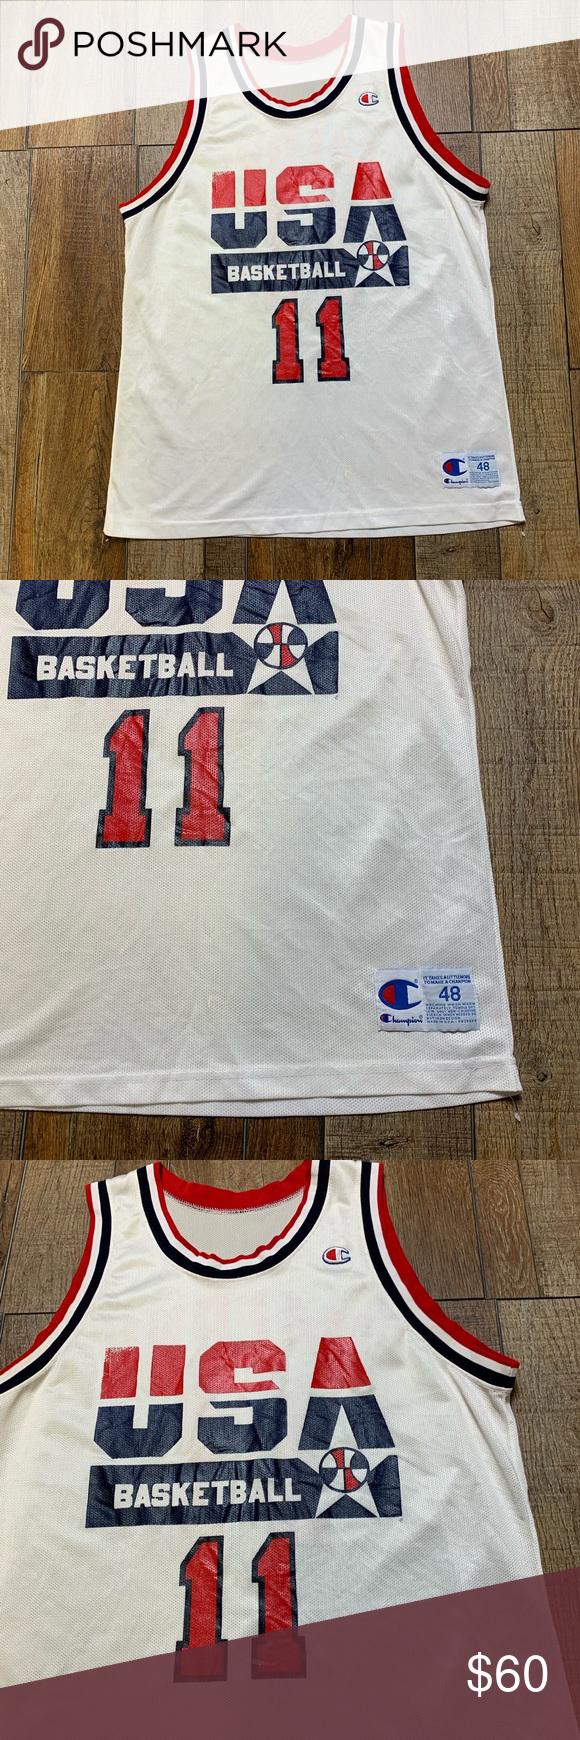 c71cce88ed5 Karl Malone Utah Jazz Team USA NBA Champion Jersey Excellent Condition Karl  Malone #11 Utah Jazz Team USA Olympics Dream Team RARE WHITE 🔥🔥🔥 Size 48  / XL ...